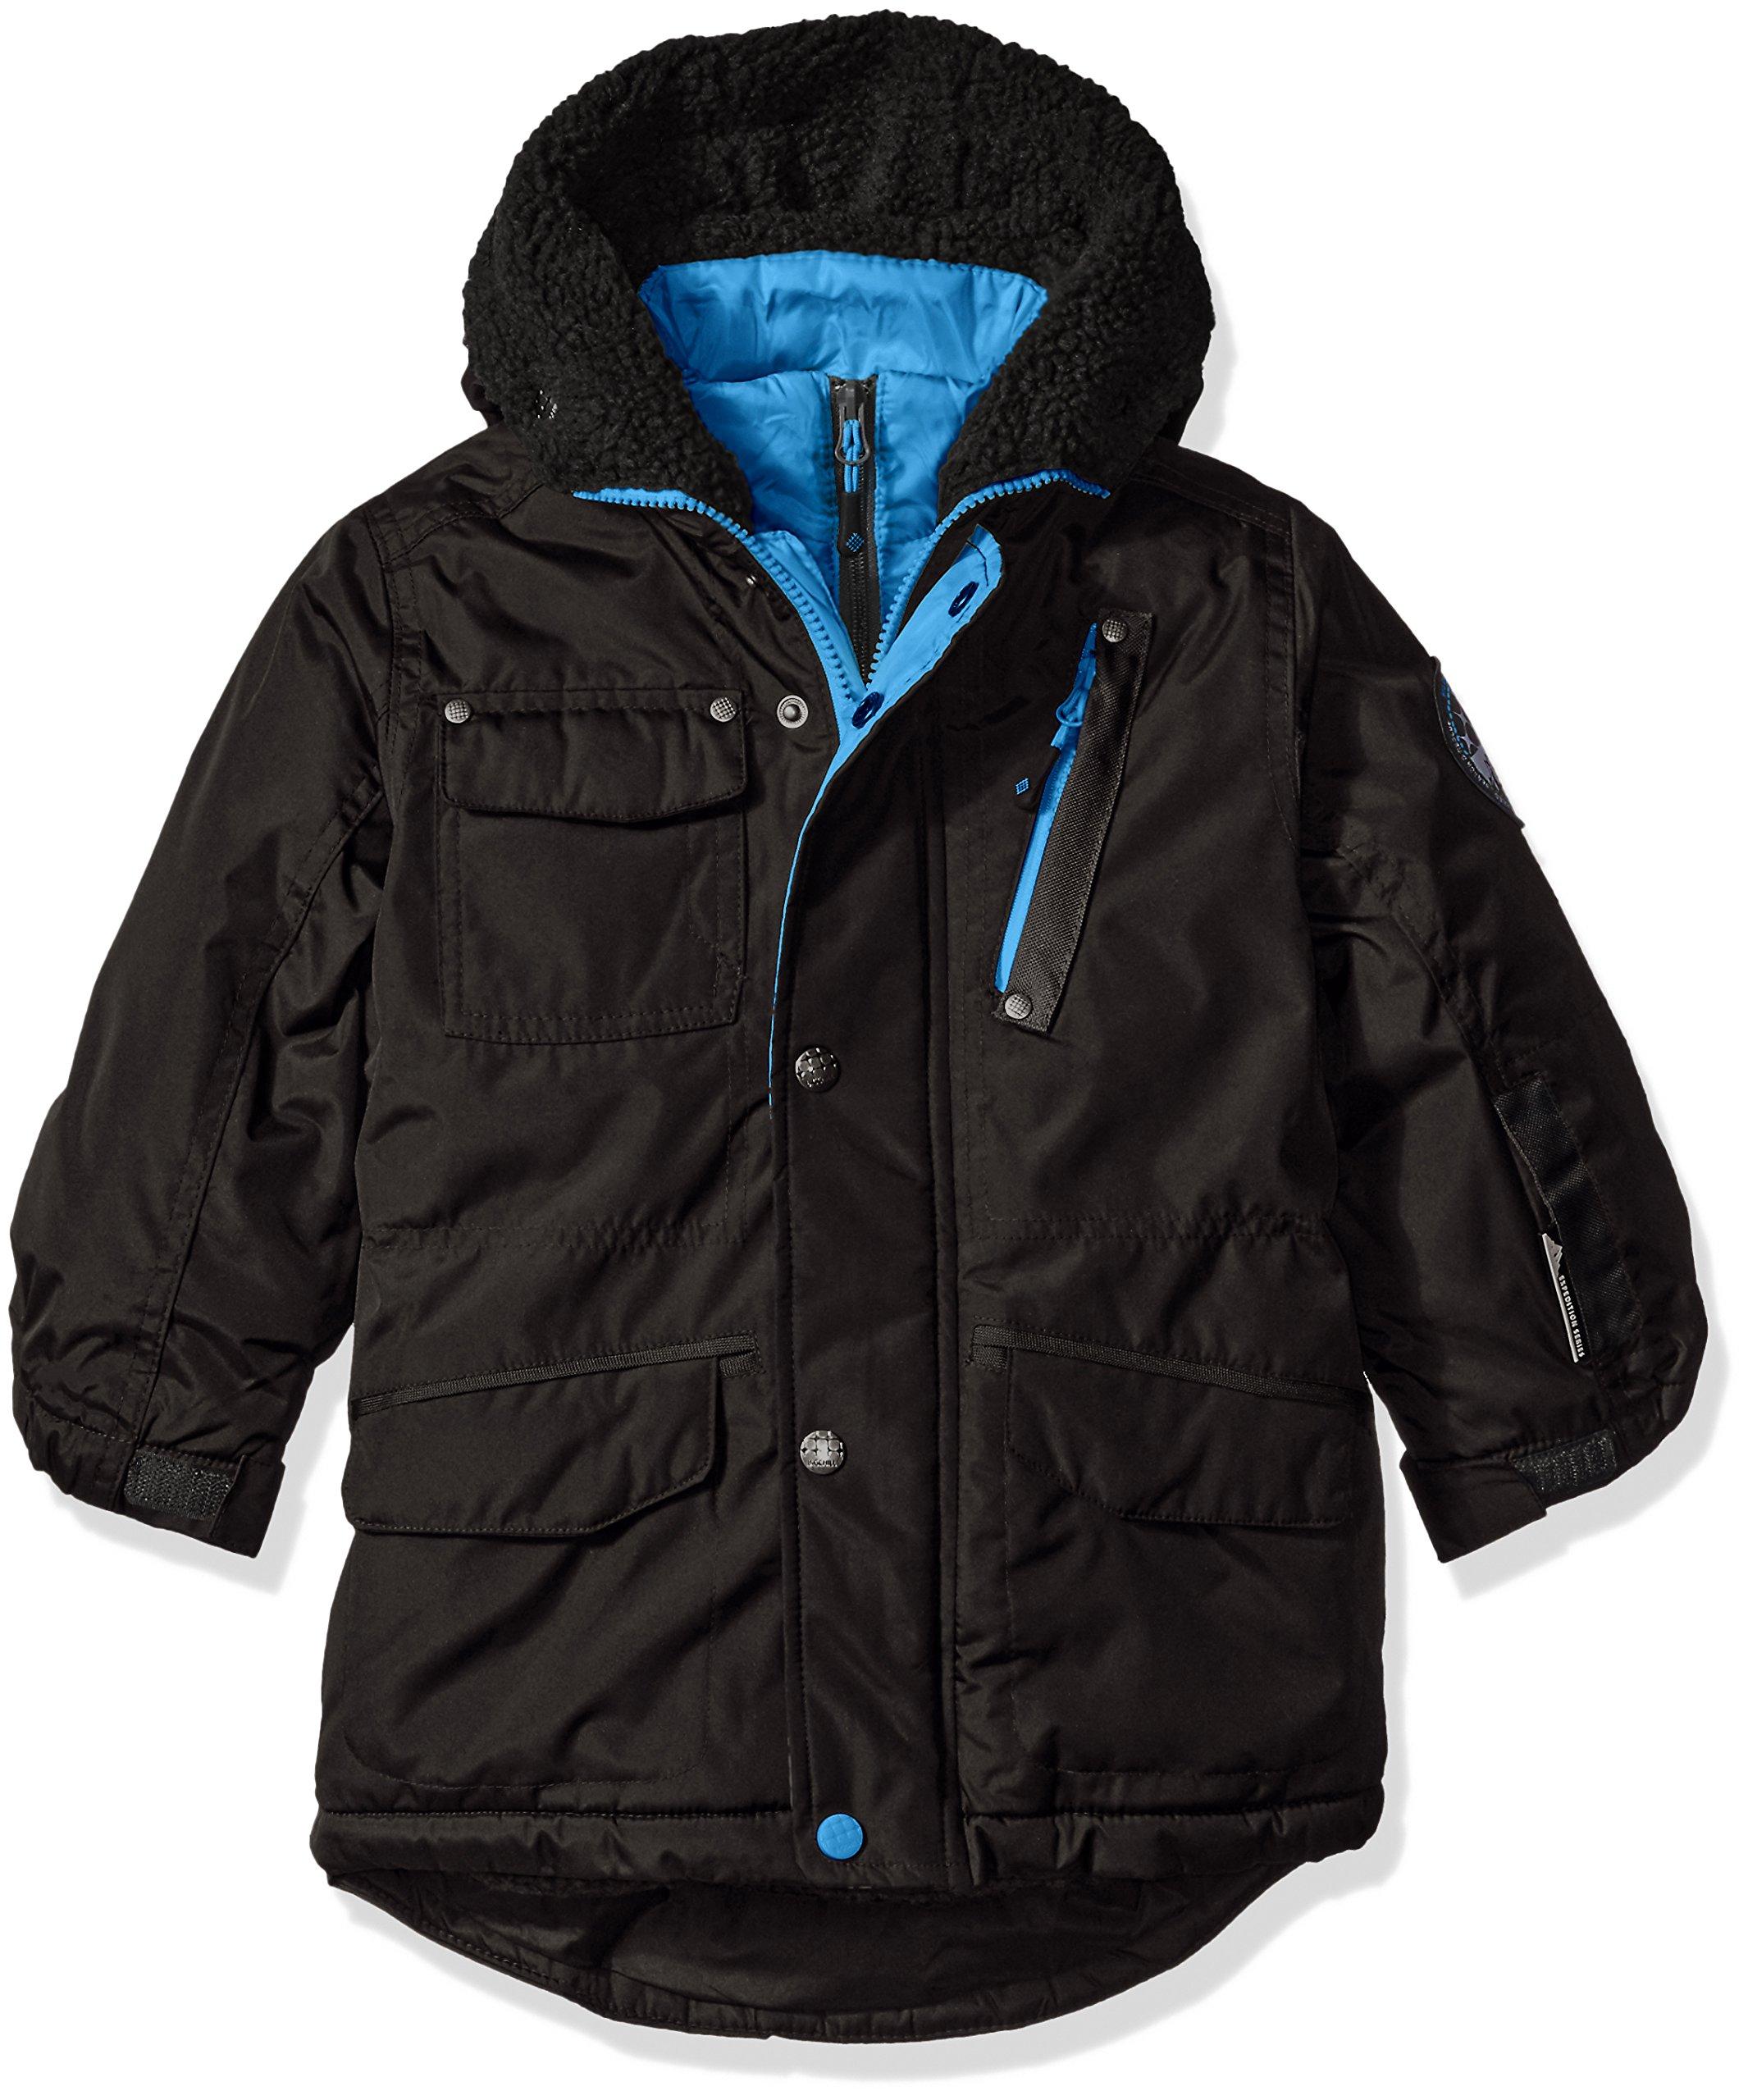 Big Chill Big Boys' Expedition Jacket with Vestee, Black, 10/12